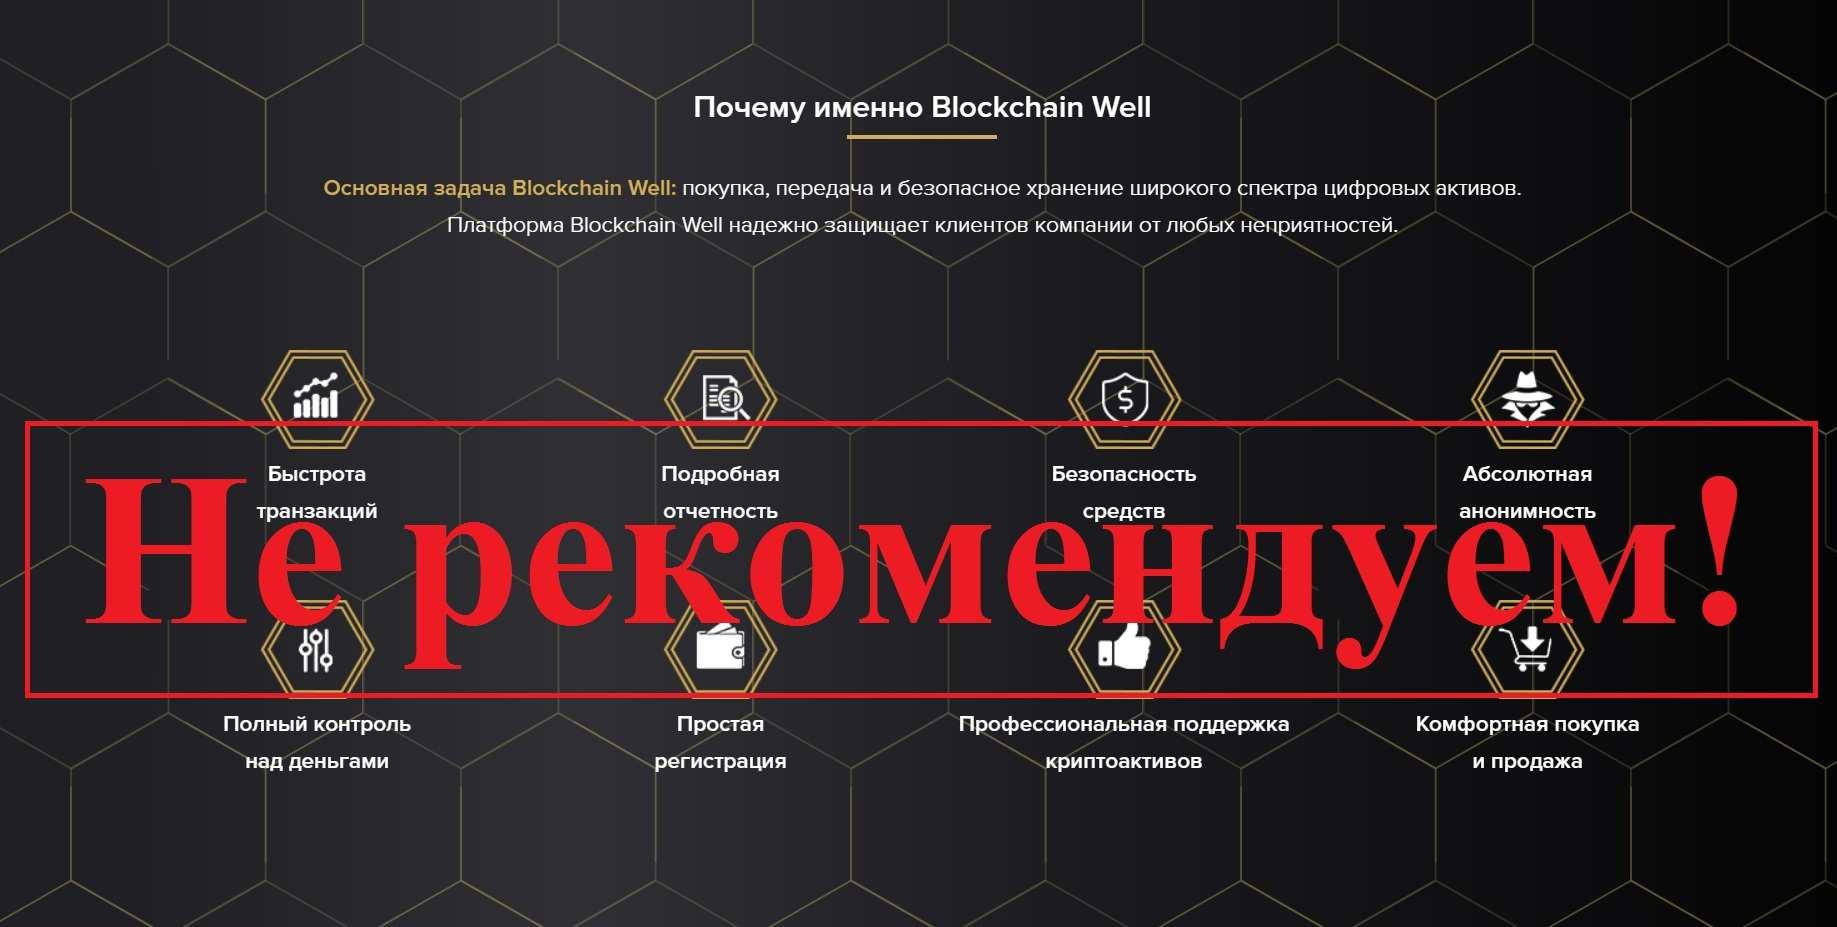 Blockchain Well – отзывы о кошельке tokensdock.com